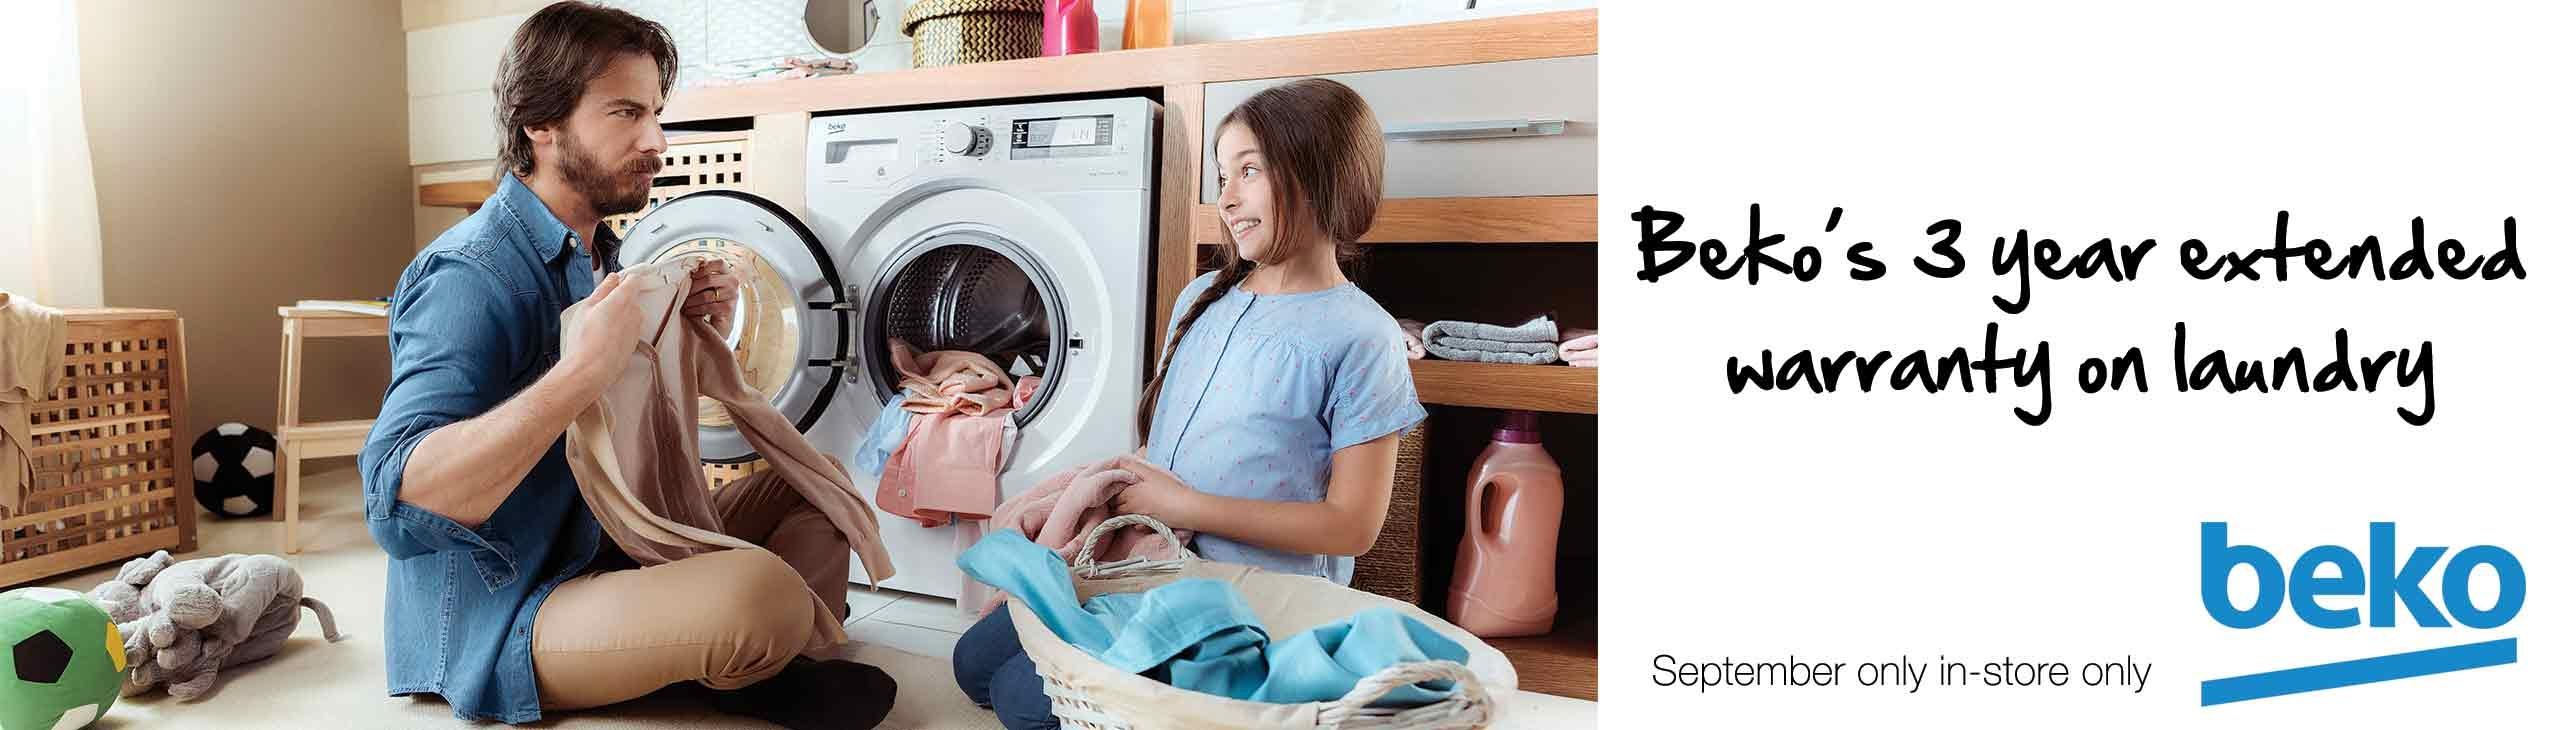 BEKO Laundry 3 Year Extended Warranty